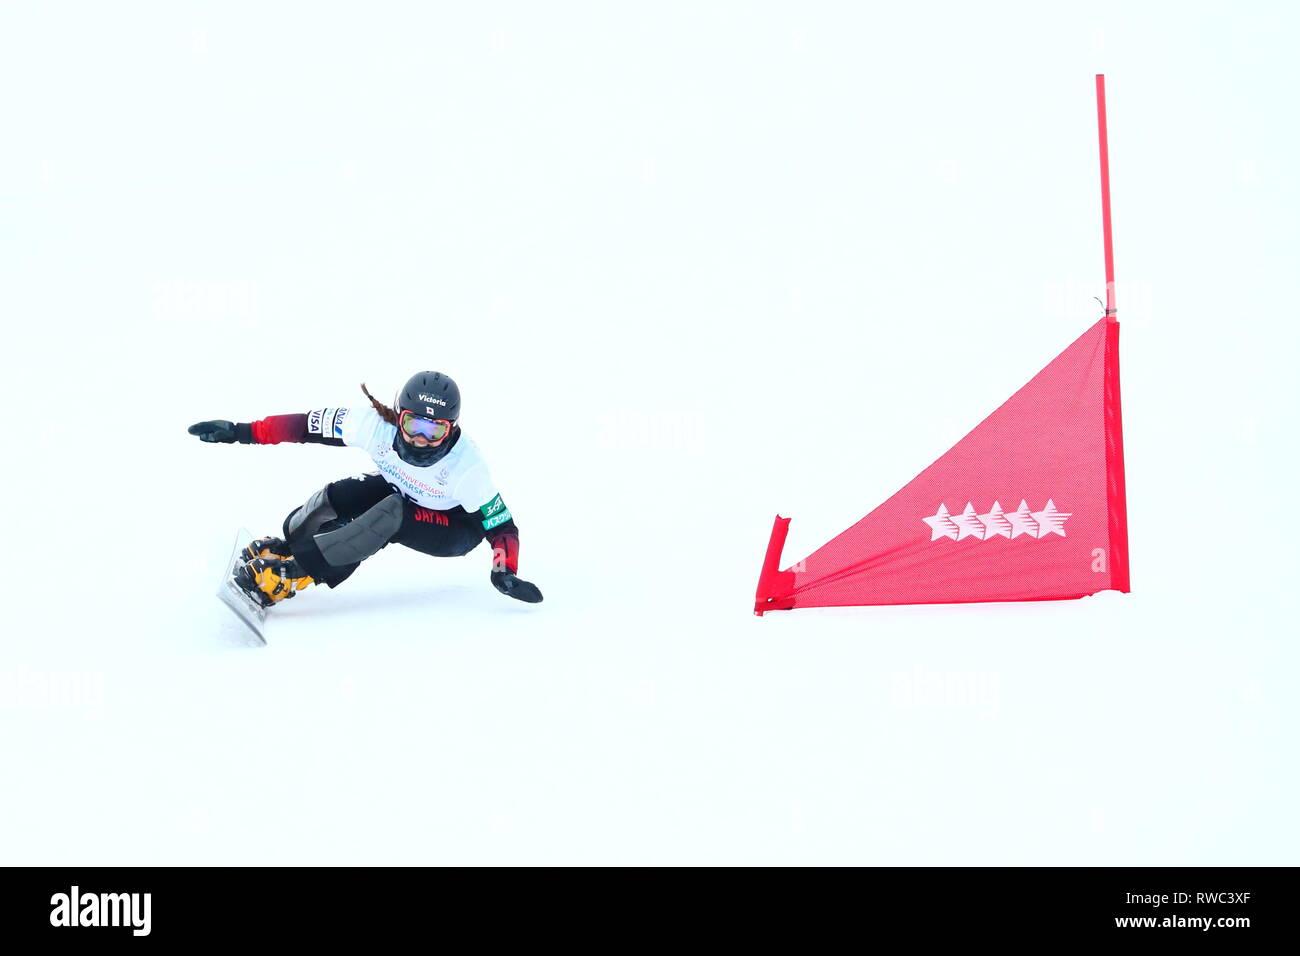 Sopka Cluster, Krasnoyarsk, Russia. 5th Mar, 2019. Asa Toyoda (JPN), MARCH 5, 2019 - Snowboarding : Women's Parallel Giant Slalom during 29th Winter Universiade Krasnoyarsk 2019 at Sopka Cluster, Krasnoyarsk, Russia. Credit: Naoki Nishimura/AFLO SPORT/Alamy Live News Stock Photo